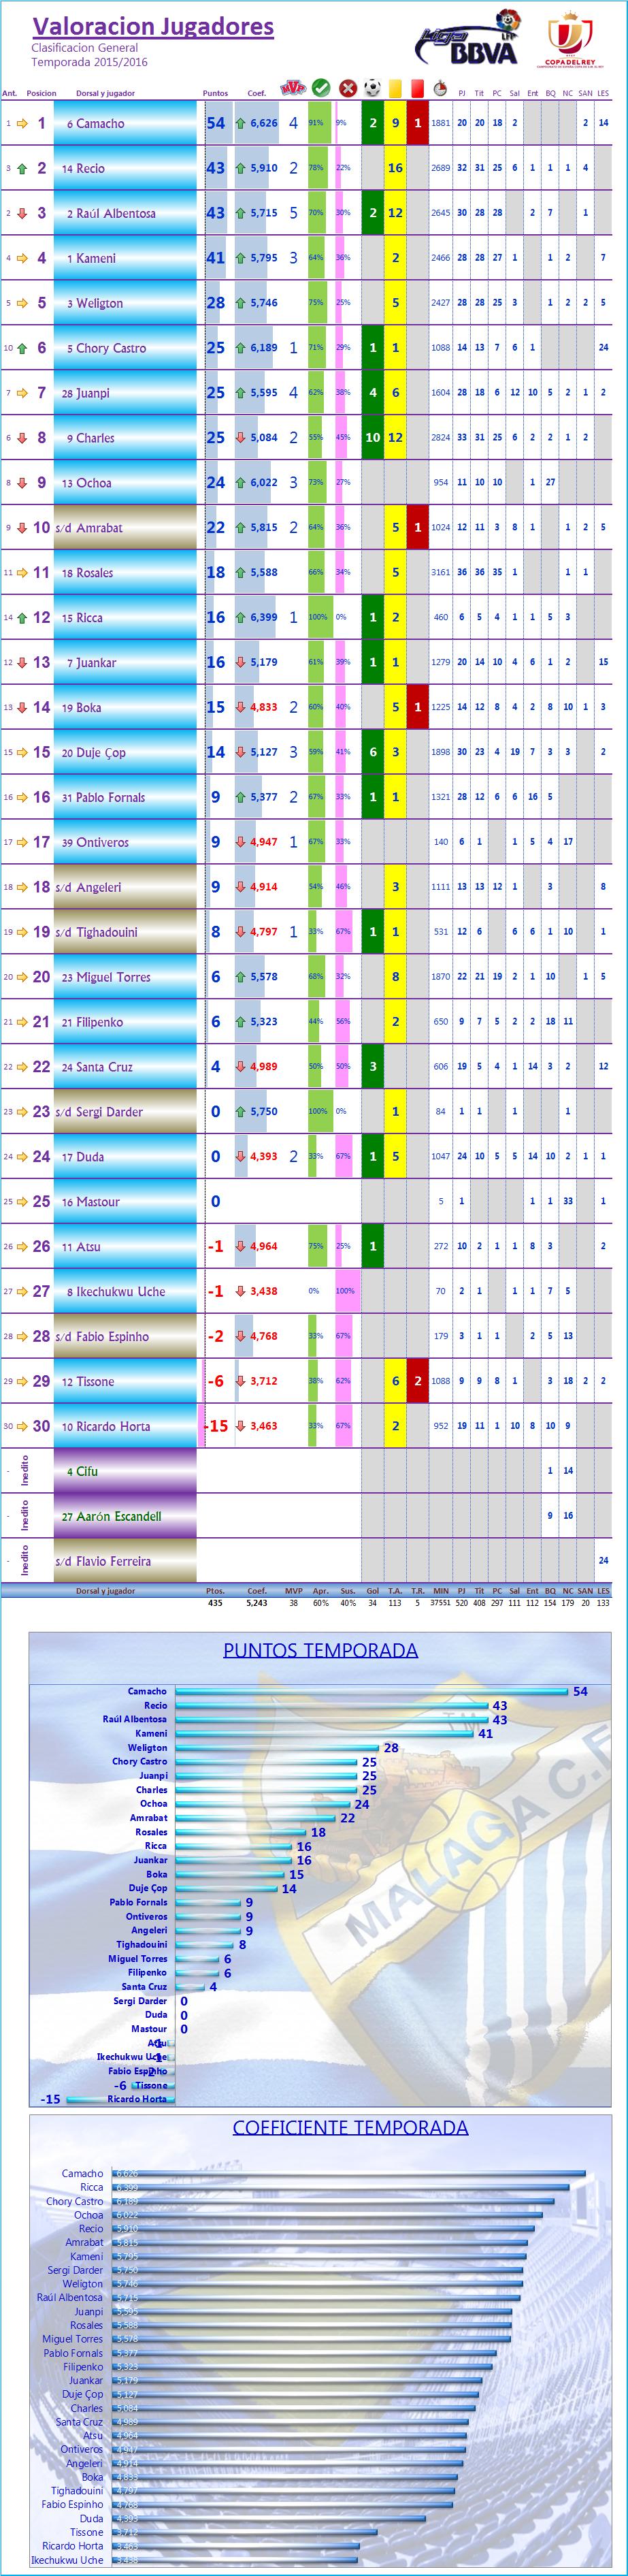 LOS MEJORES DEL MALAGA CF. Temp.2015/16: J37ª: RC CELTA 1-0 MALAGA CF Los_Mdel_MCF_General